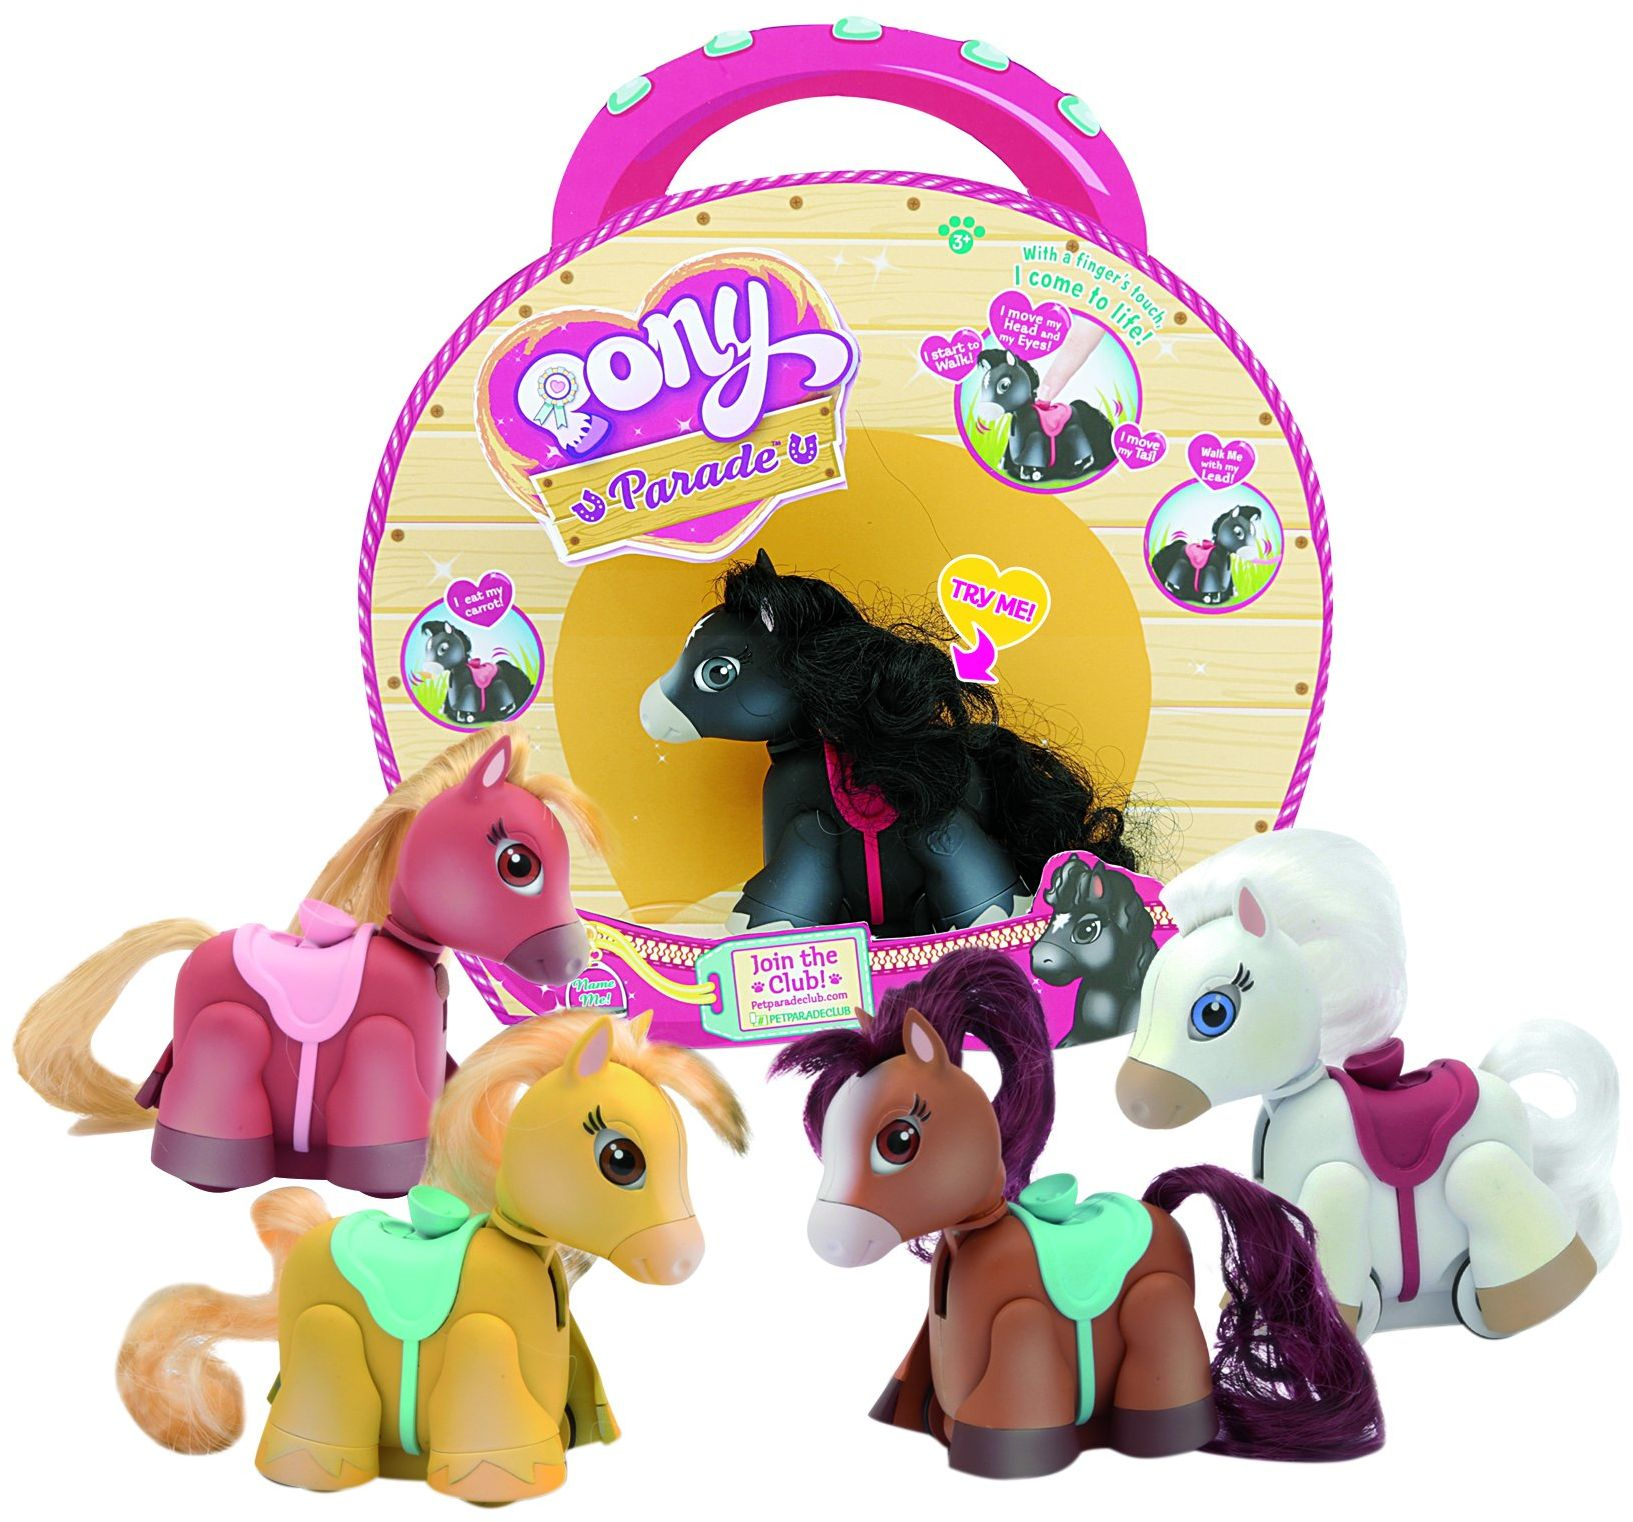 Pet Parade-PTN0000 Pet Parade Pony, 22 x 20 cm (Giochi Preziosi Spagna PTN0000)